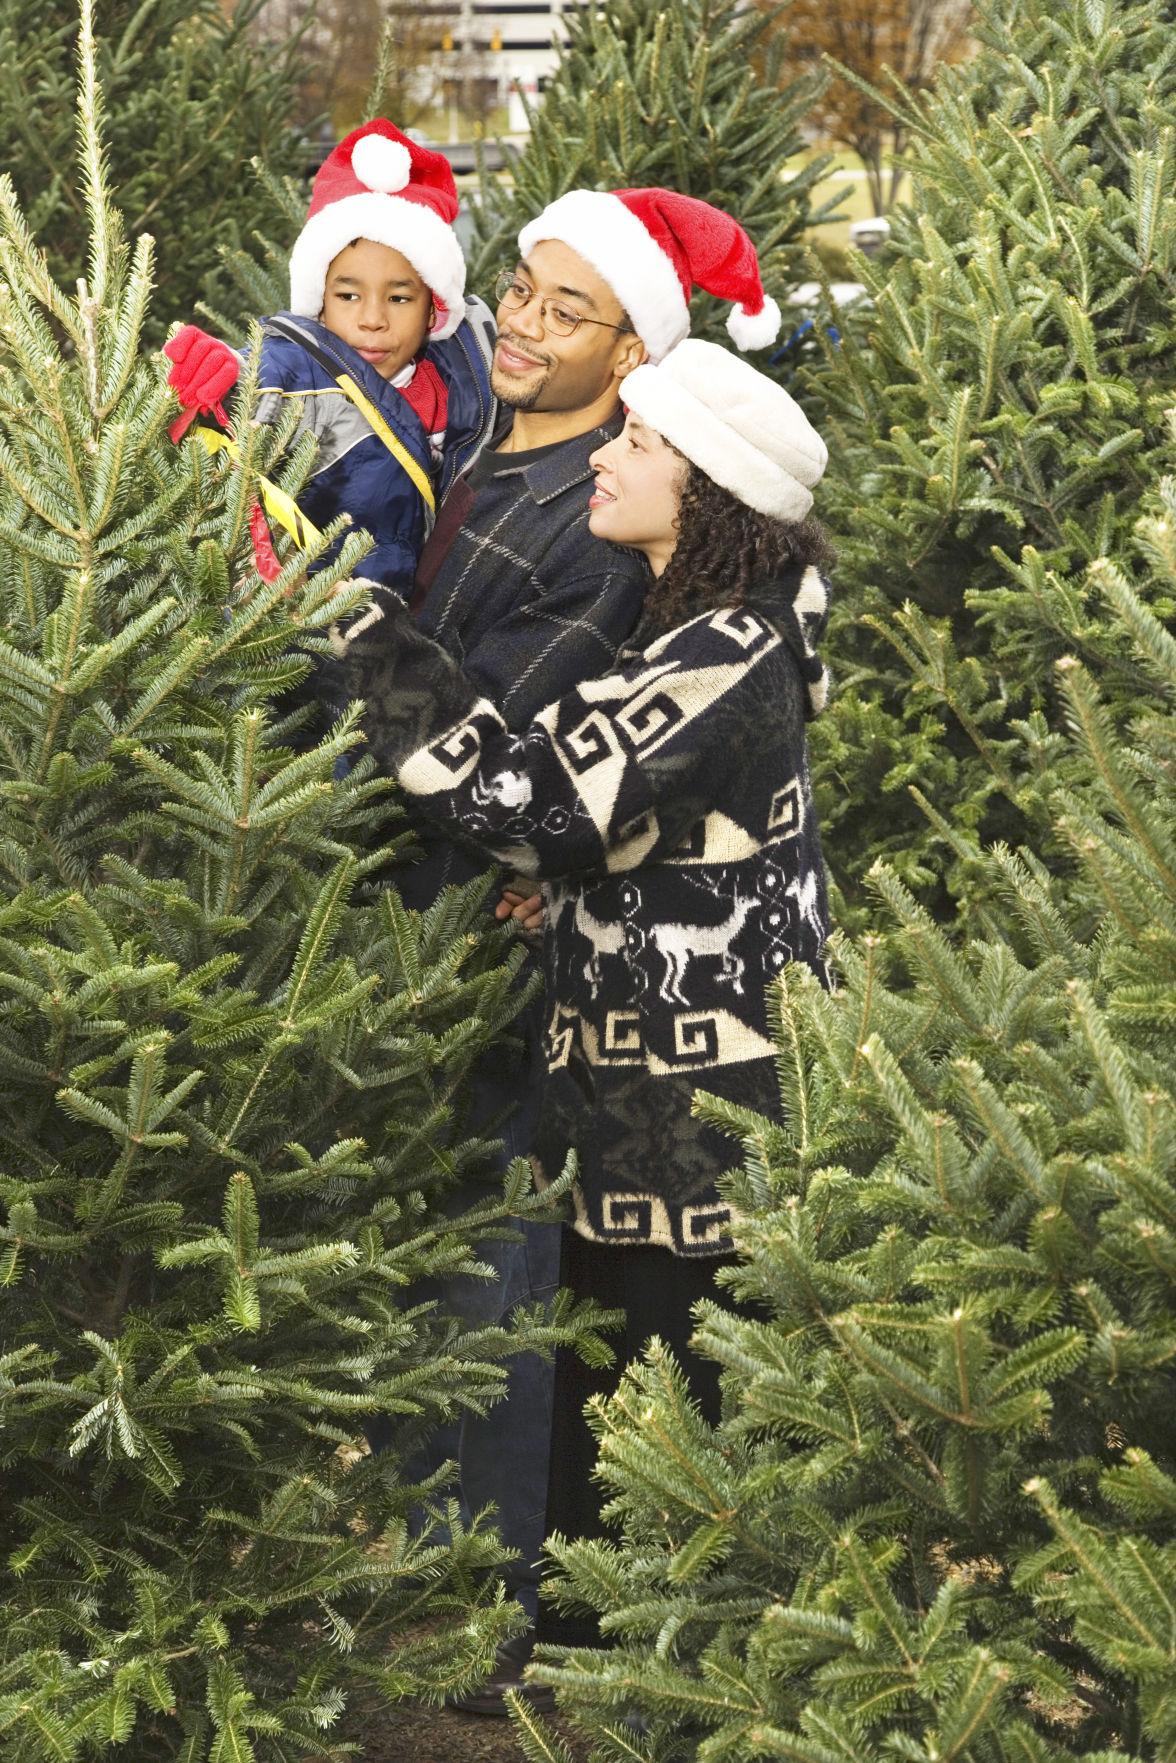 Keep Christmas tree fresh through the holiday season | News ...